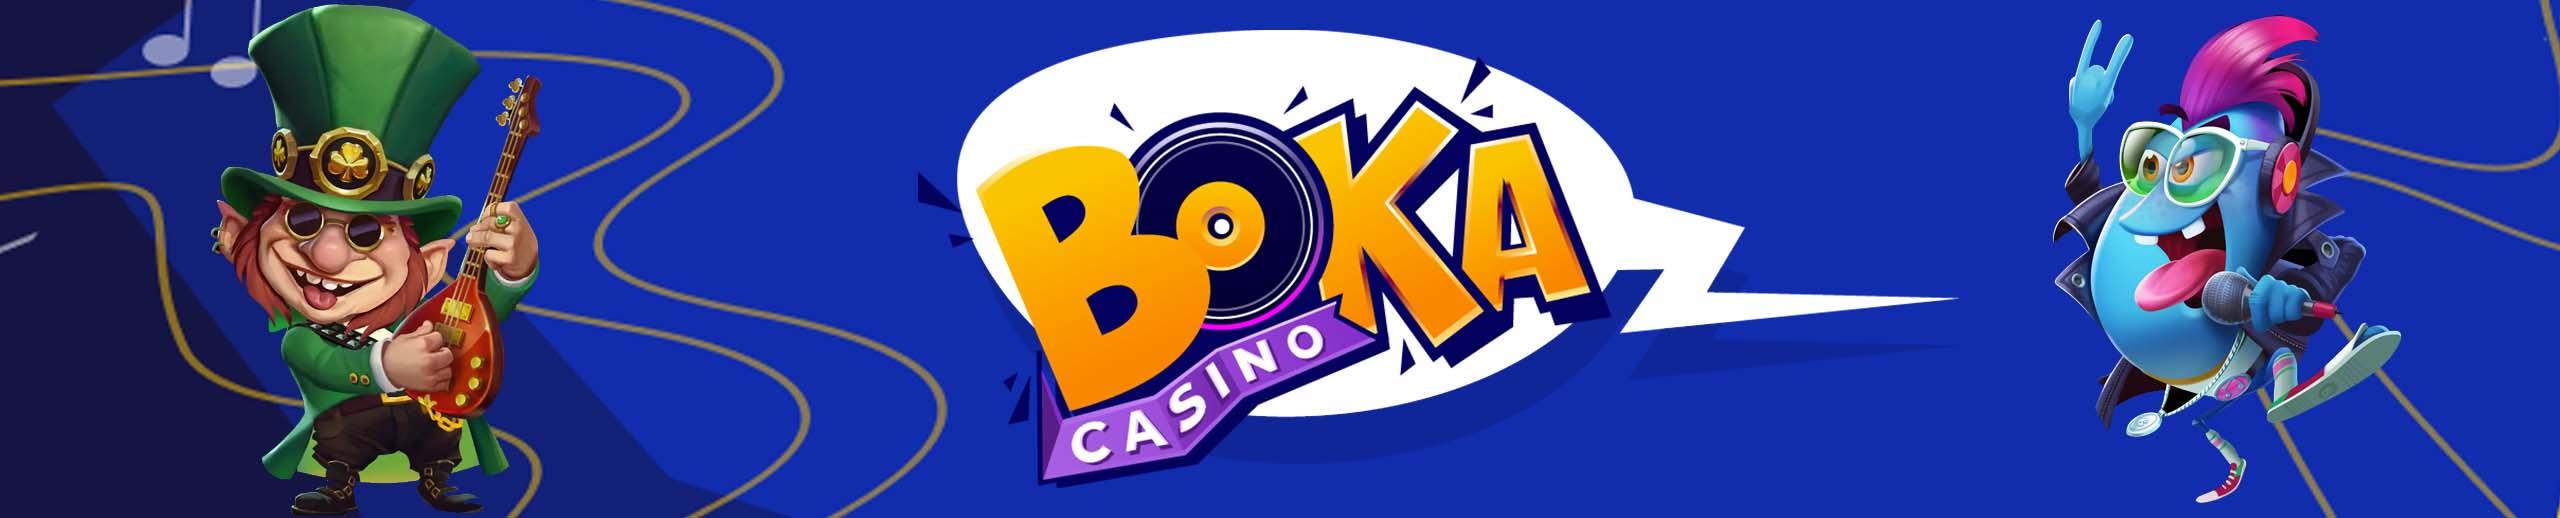 Boka Casino Test